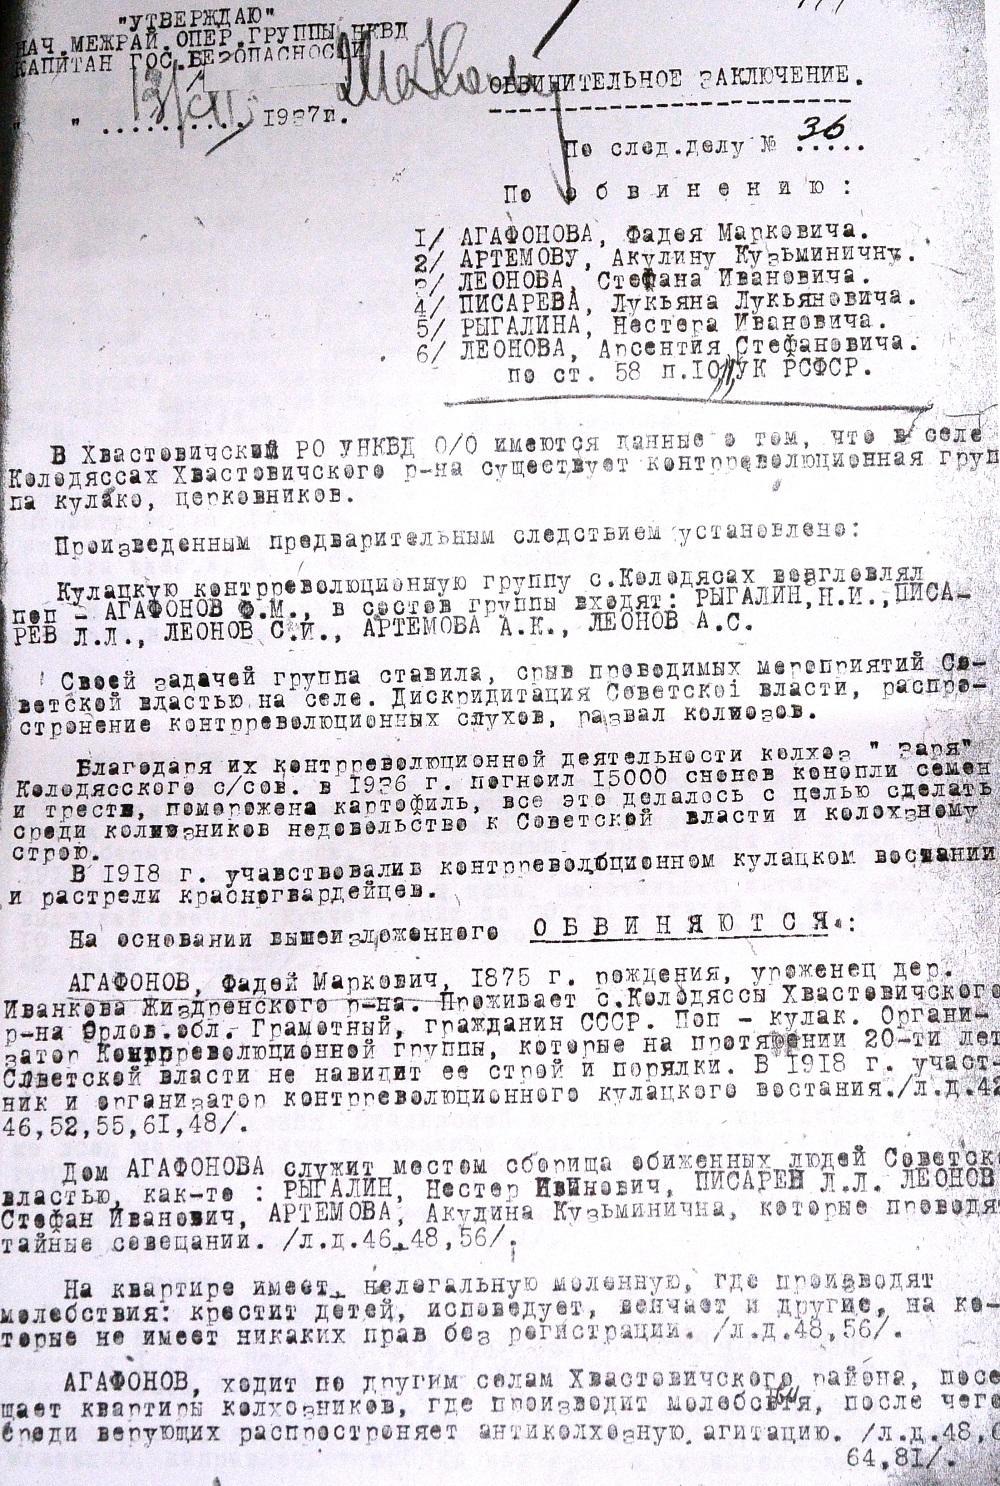 Фаддей Маркович Агафонов, иерей